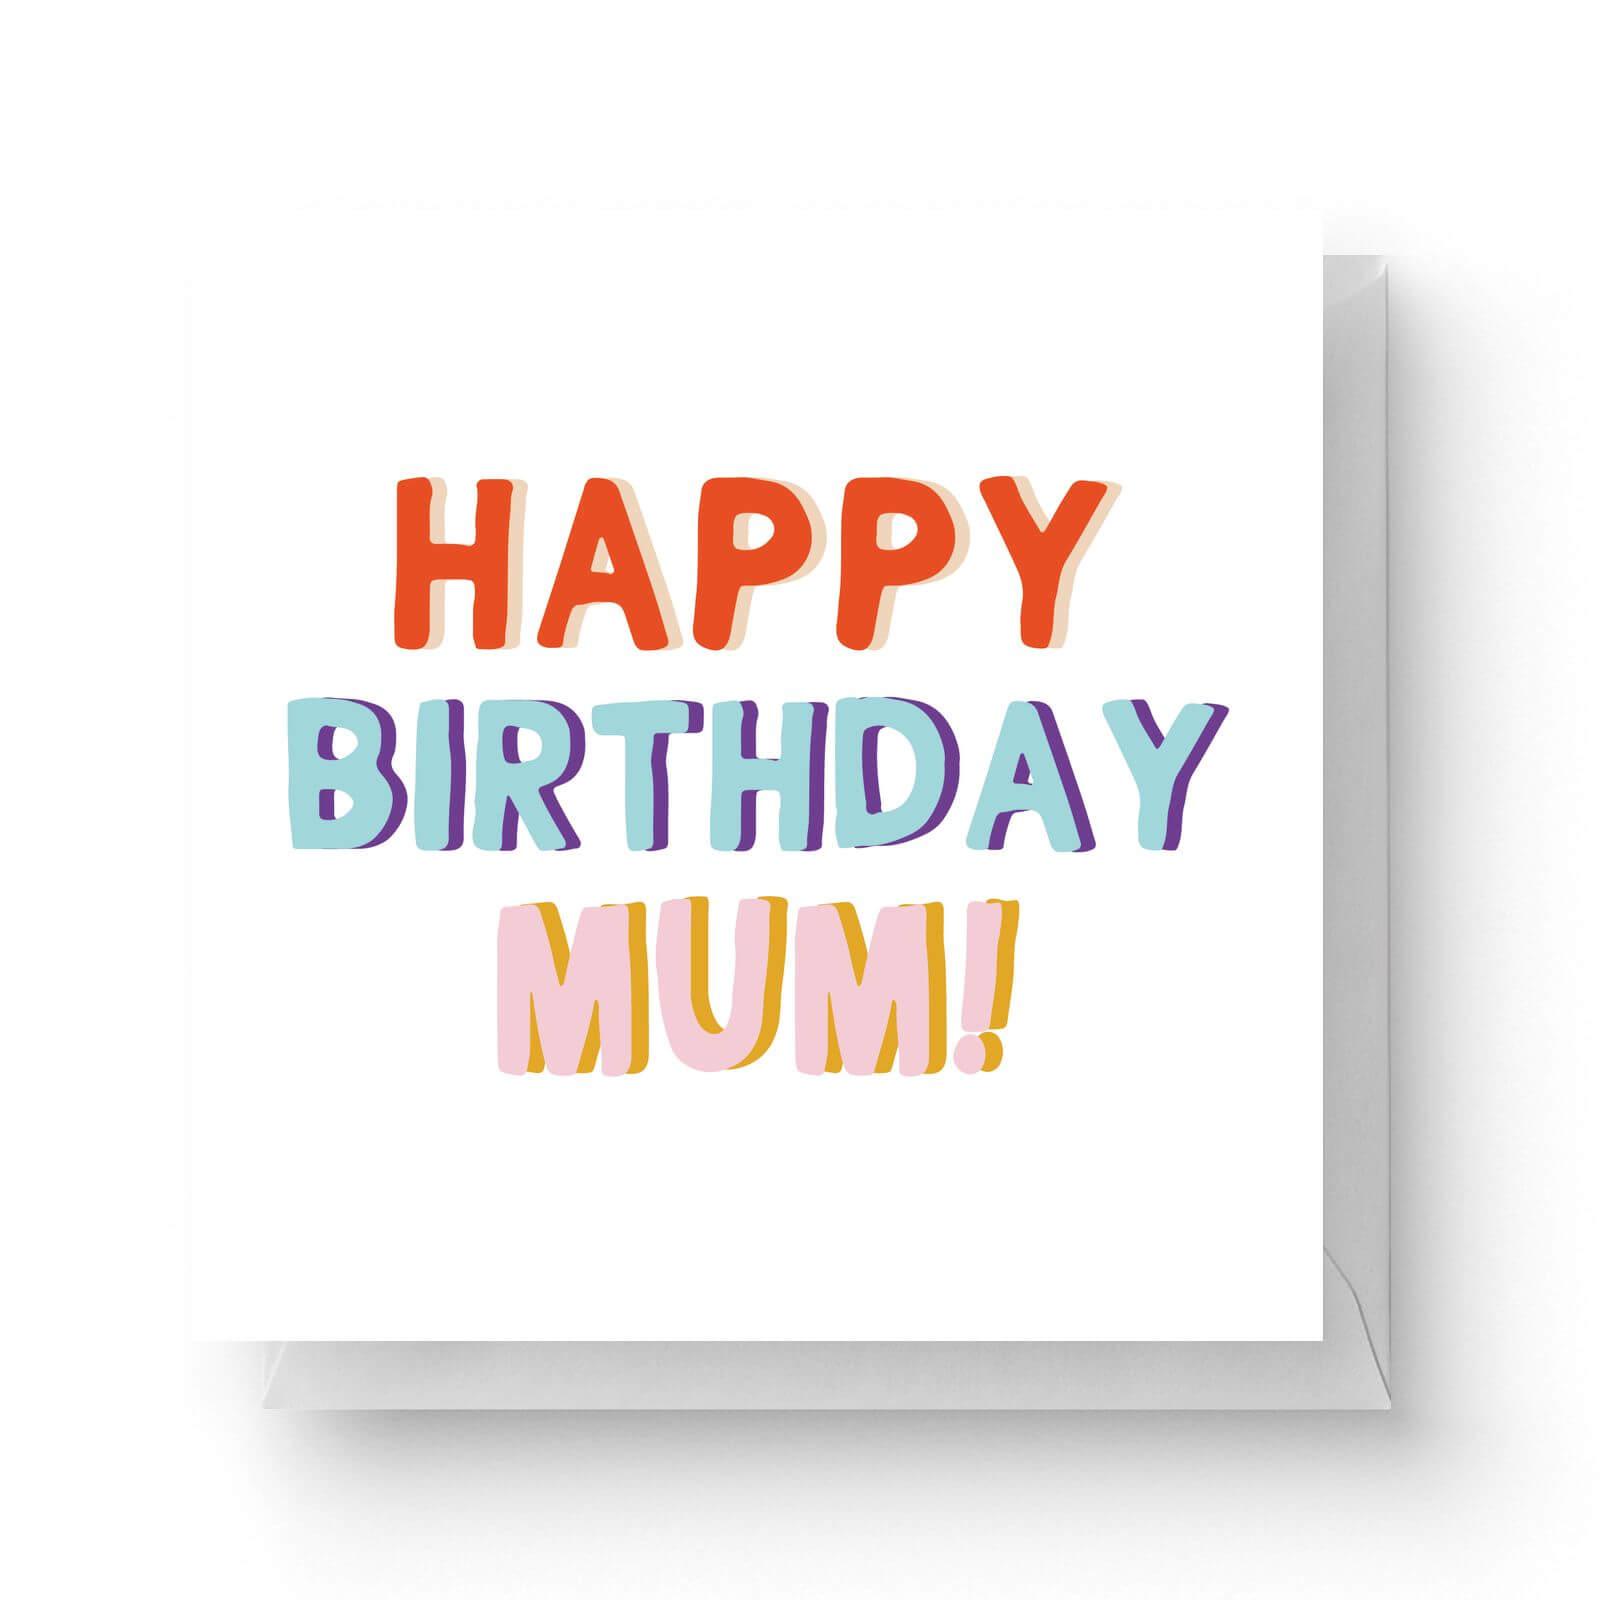 Image of Happy Birthday Mum Square Greetings Card (14.8cm x 14.8cm)